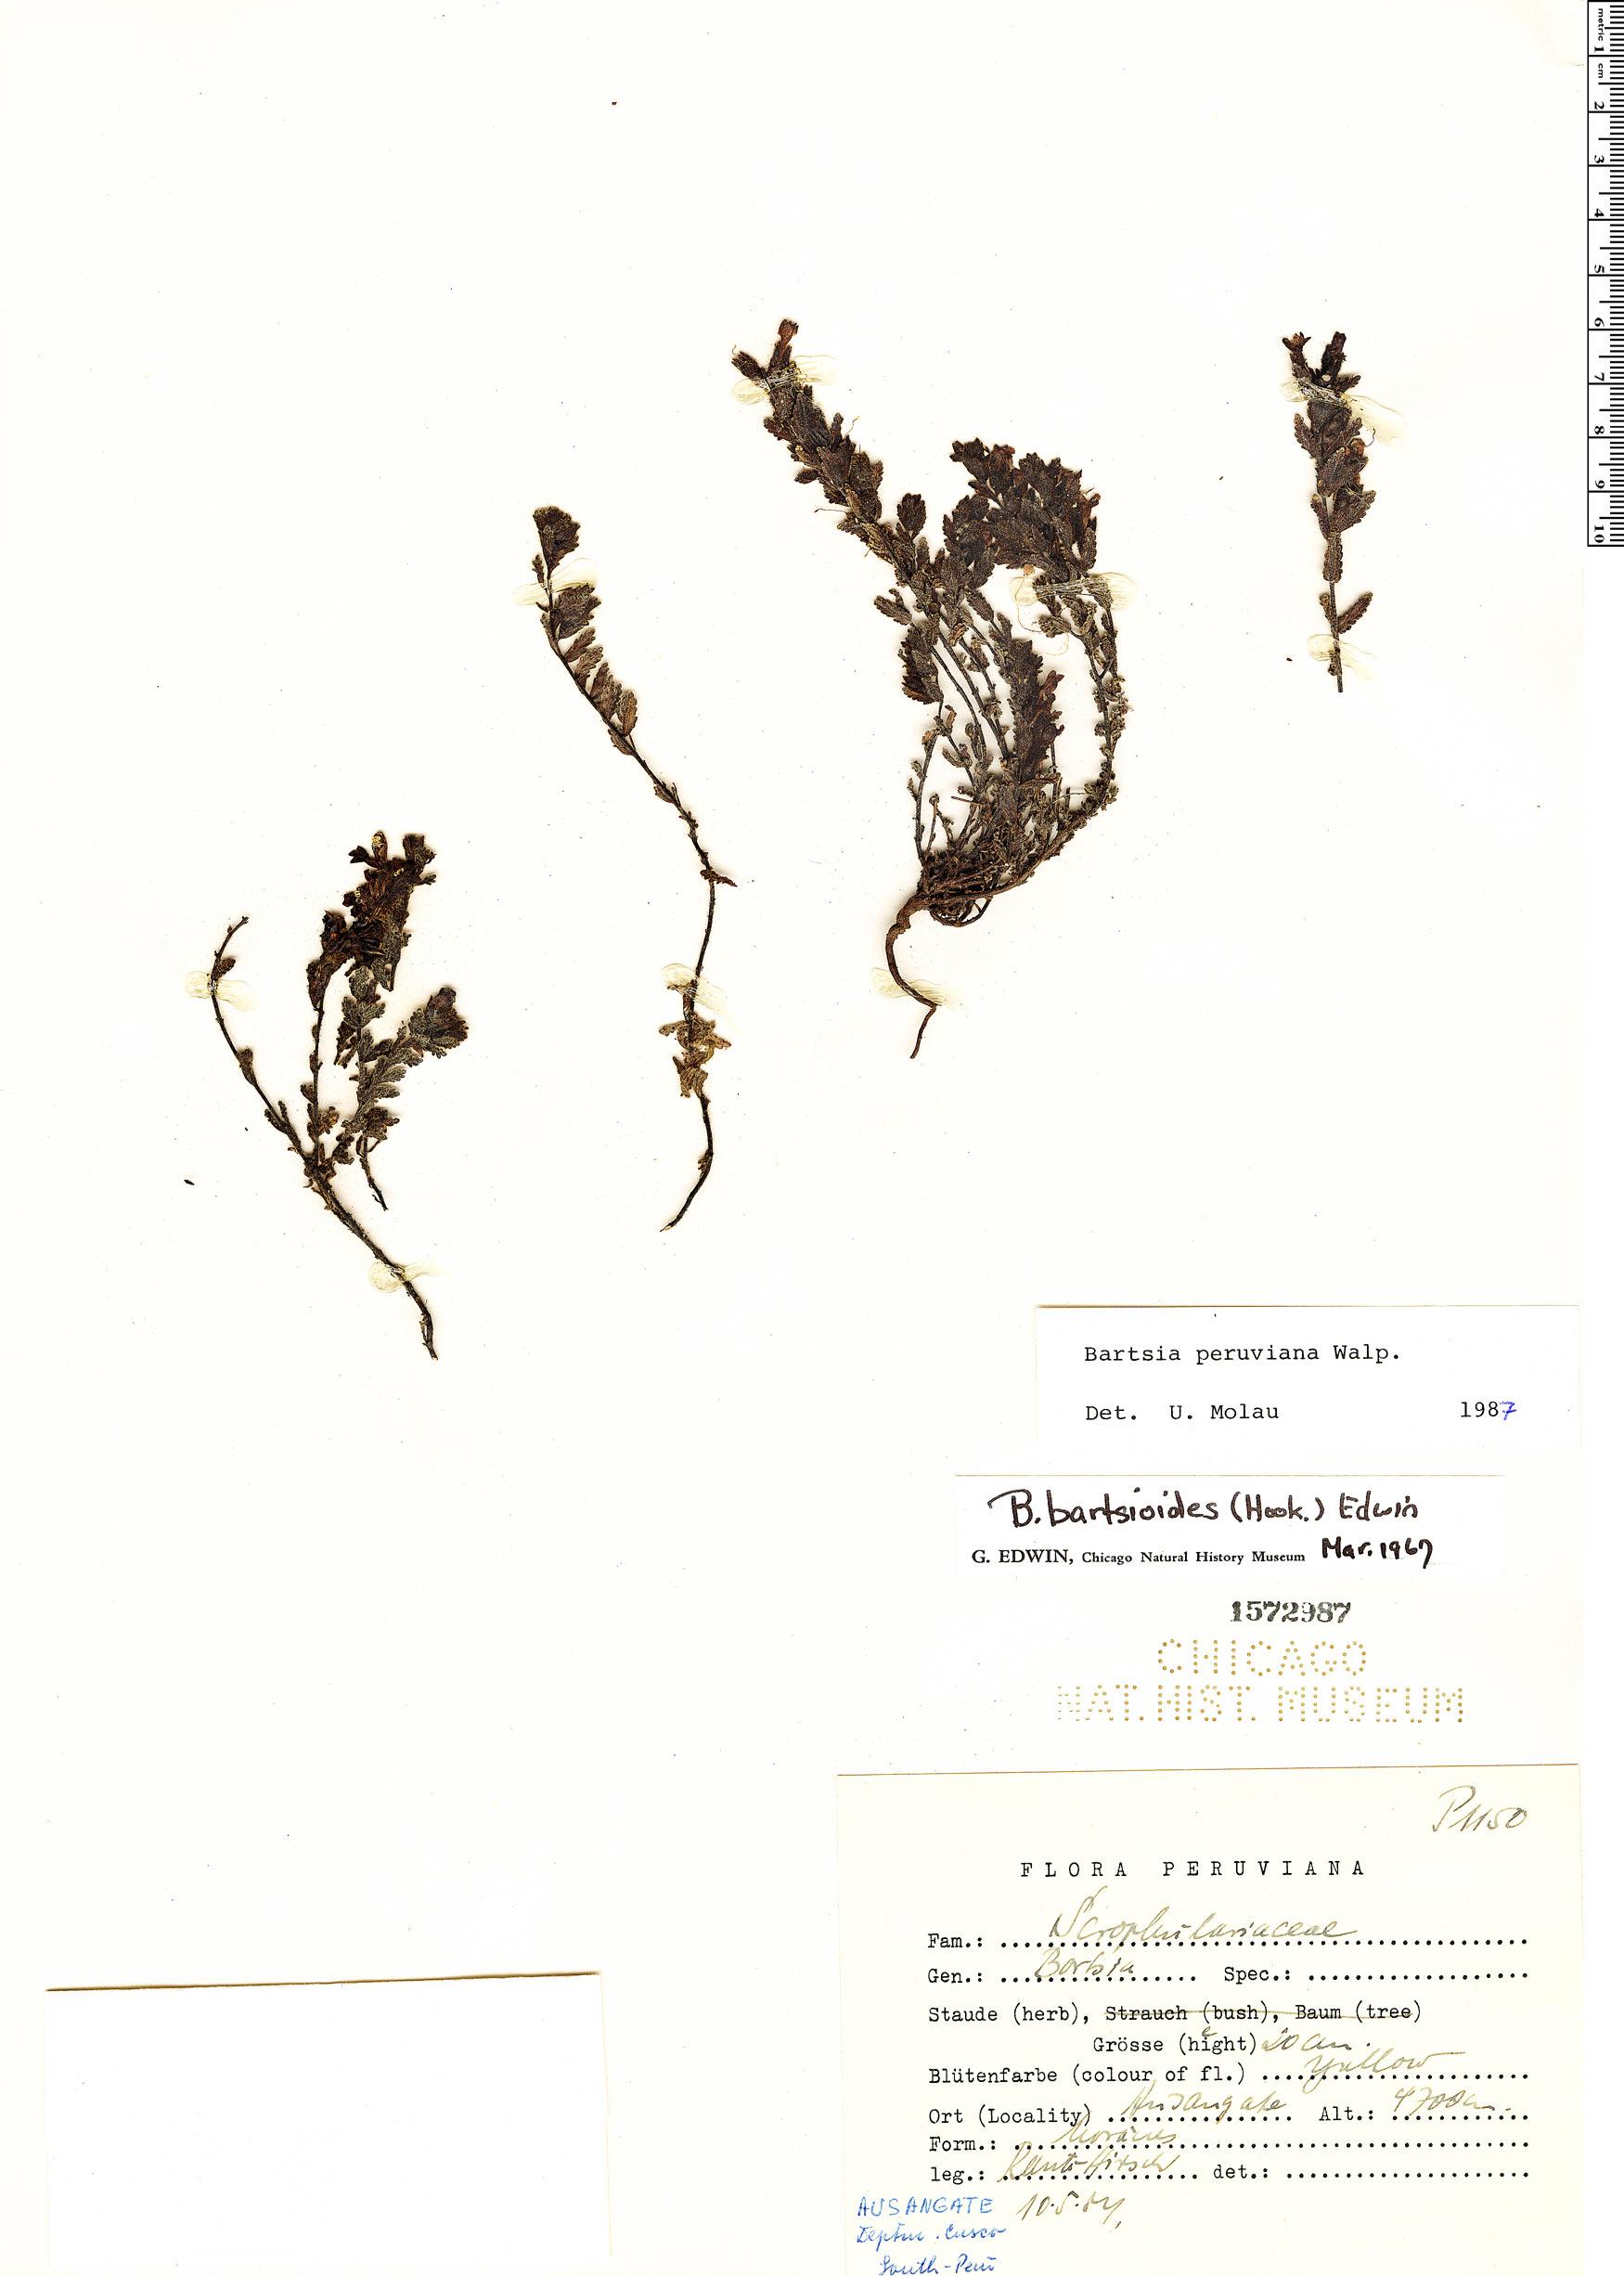 Specimen: Bartsia peruviana